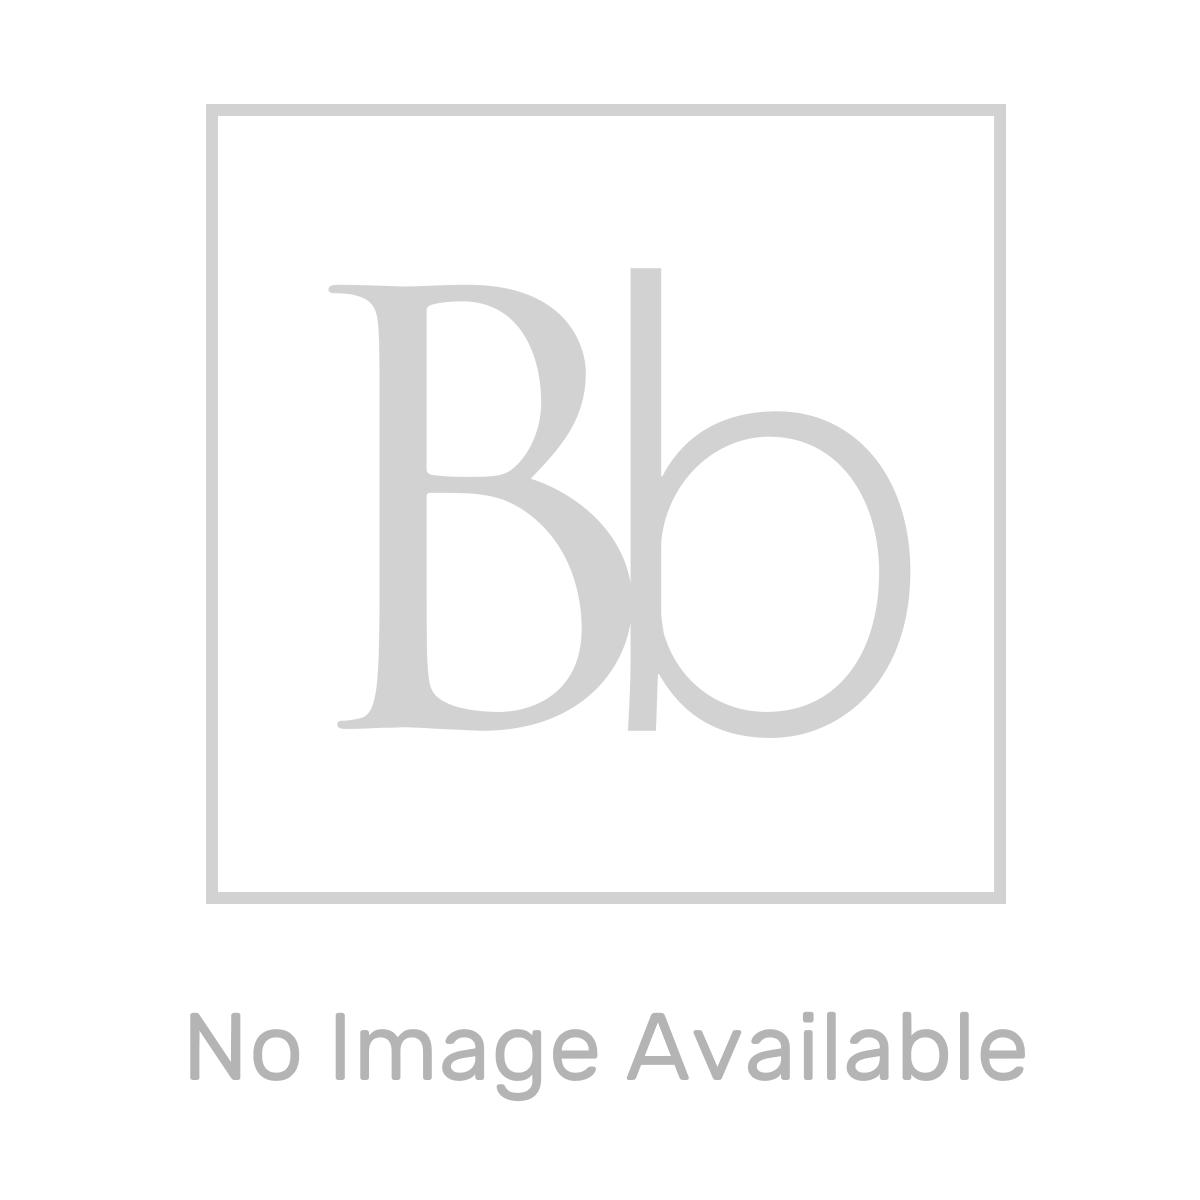 Elation Sendai White Gloss Framed Mirror 450mm